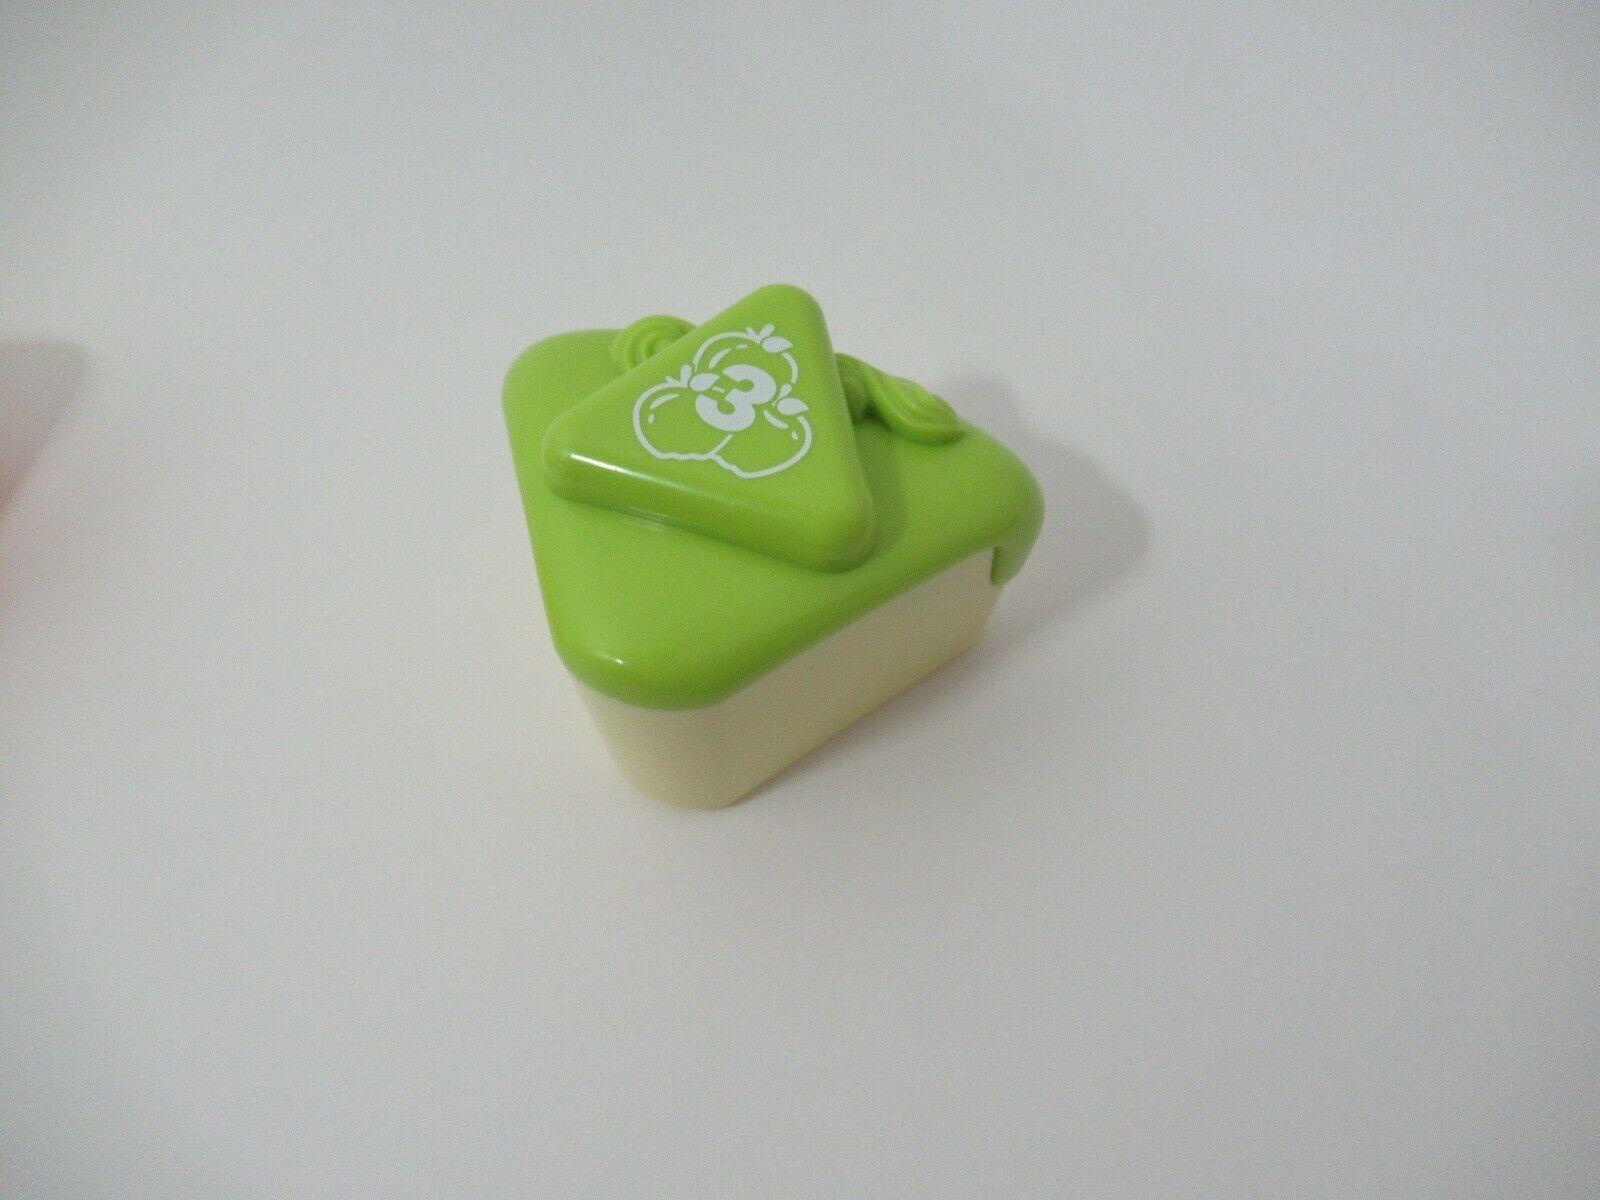 LeapFrog Musical Rainbow Tea Set Cake Slice Replacement Part green apple # 3 - $4.94